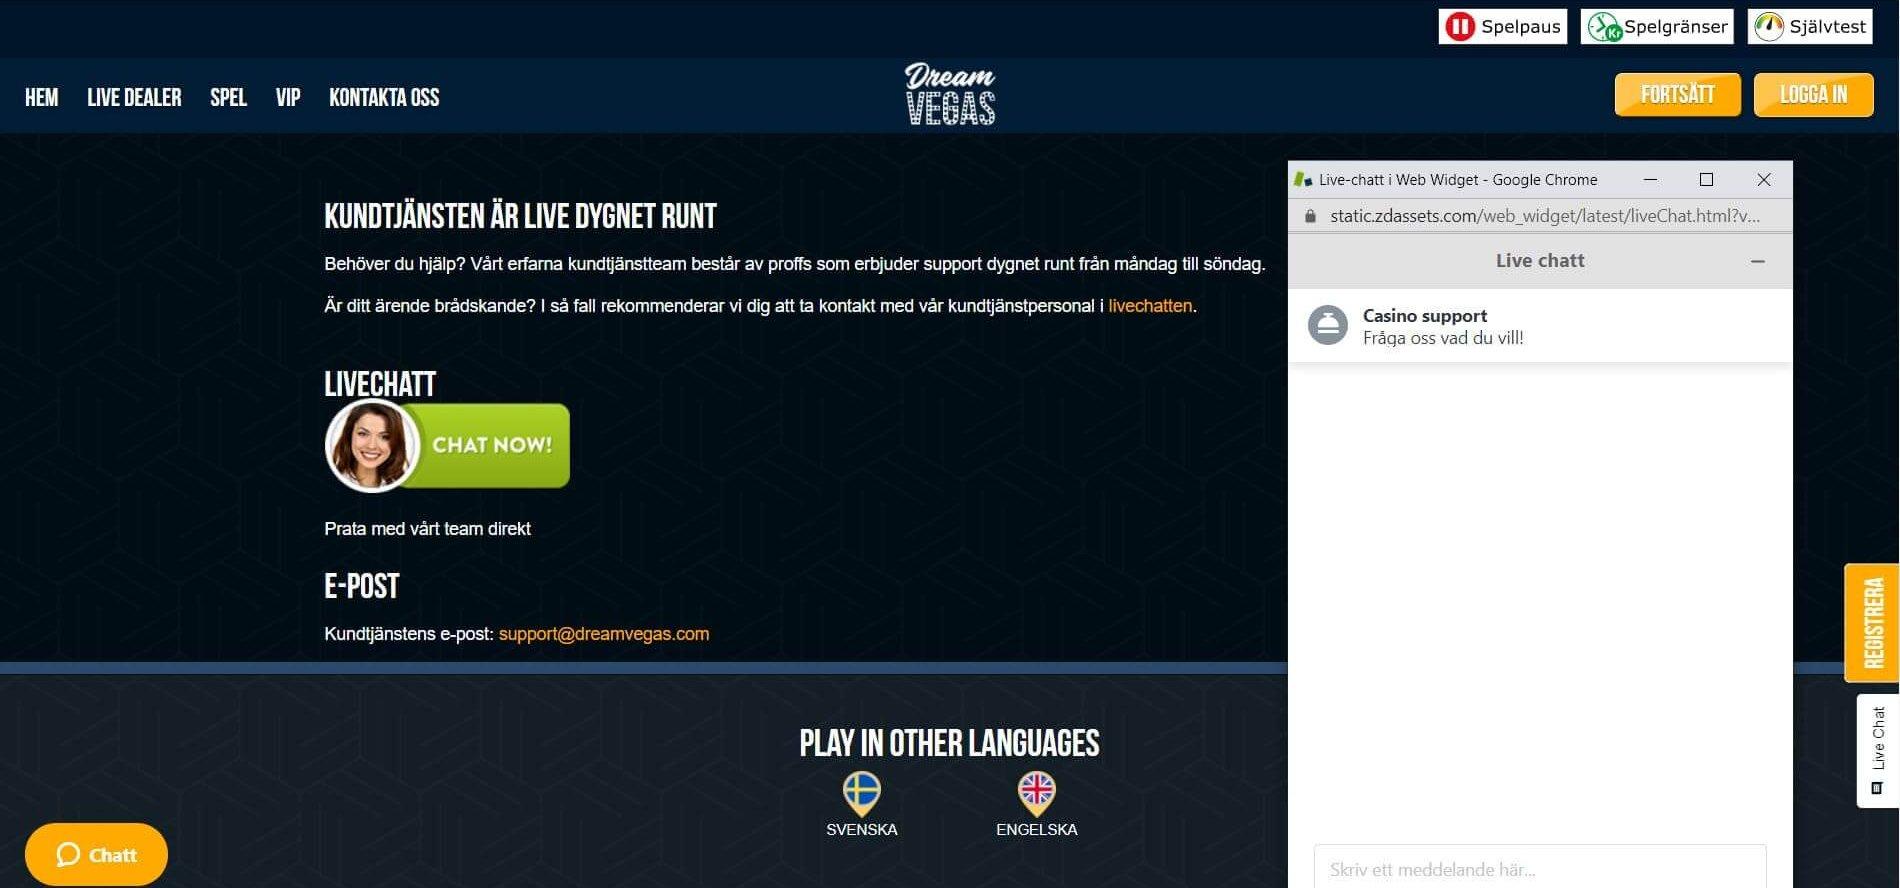 Dream Vegas erbjuder support via epost live chat